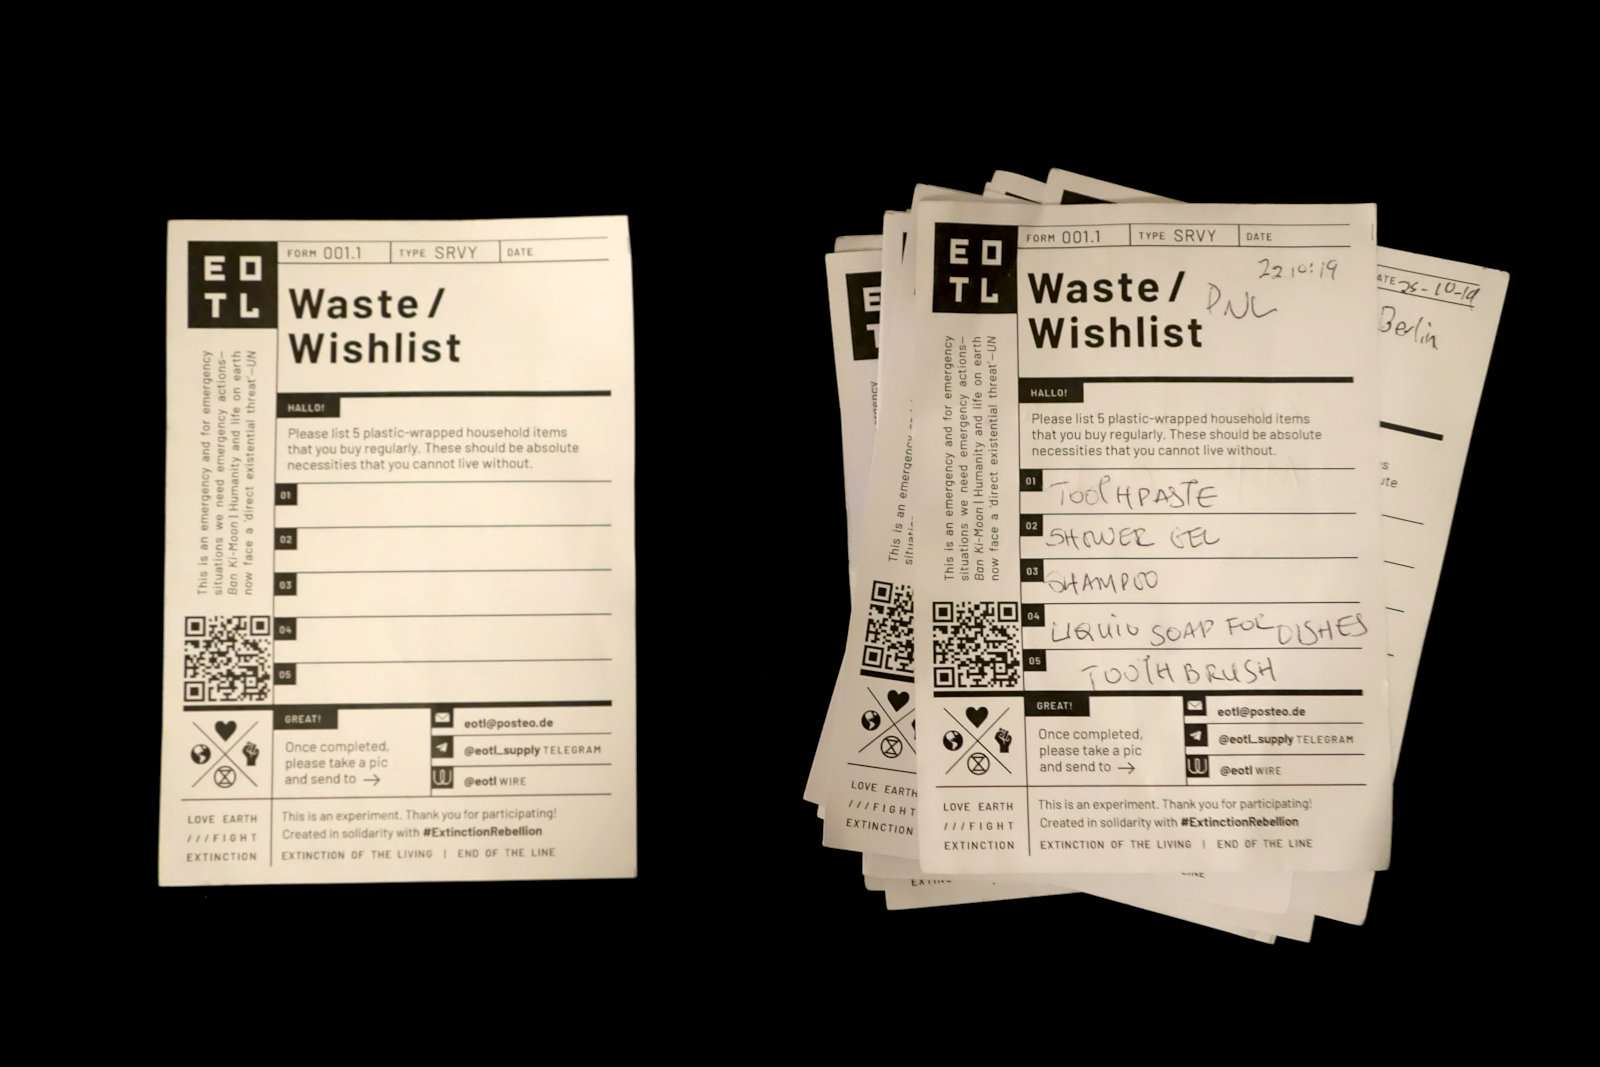 5 Essential Items - Waste/wishlist